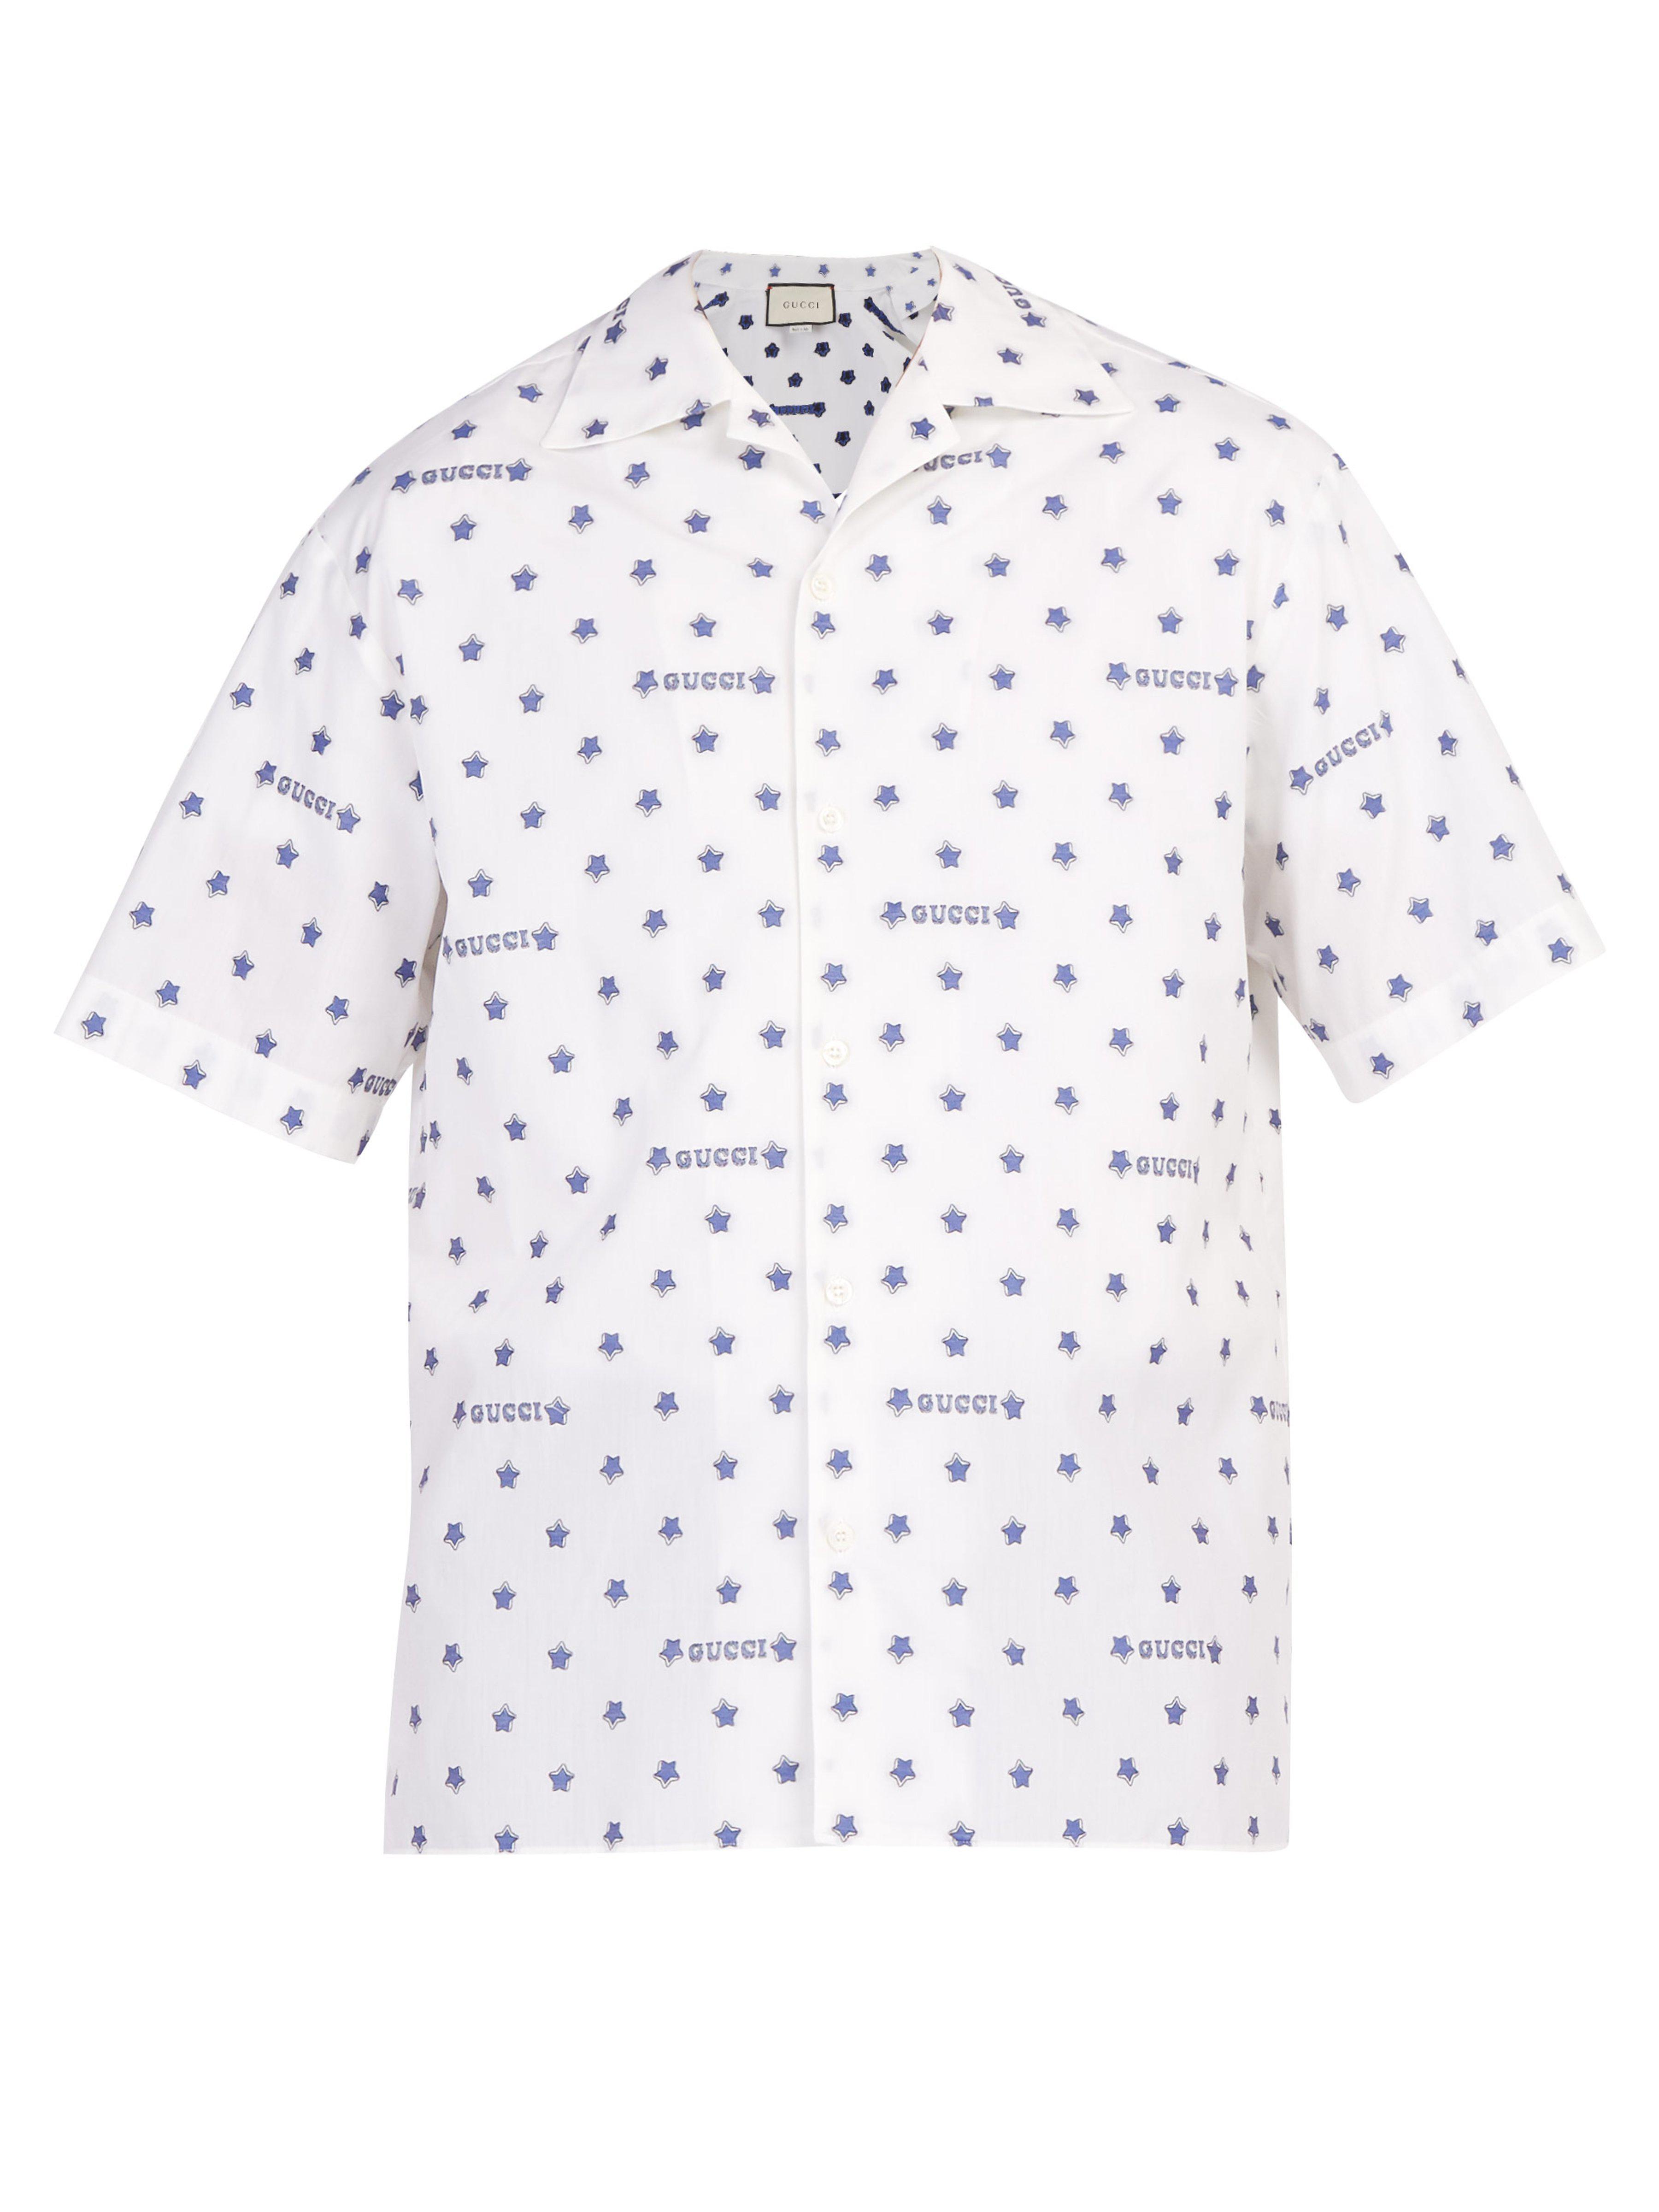 29f4cad29c19 Gucci - White Star Print Cotton Bowling Shirt for Men - Lyst. View  fullscreen